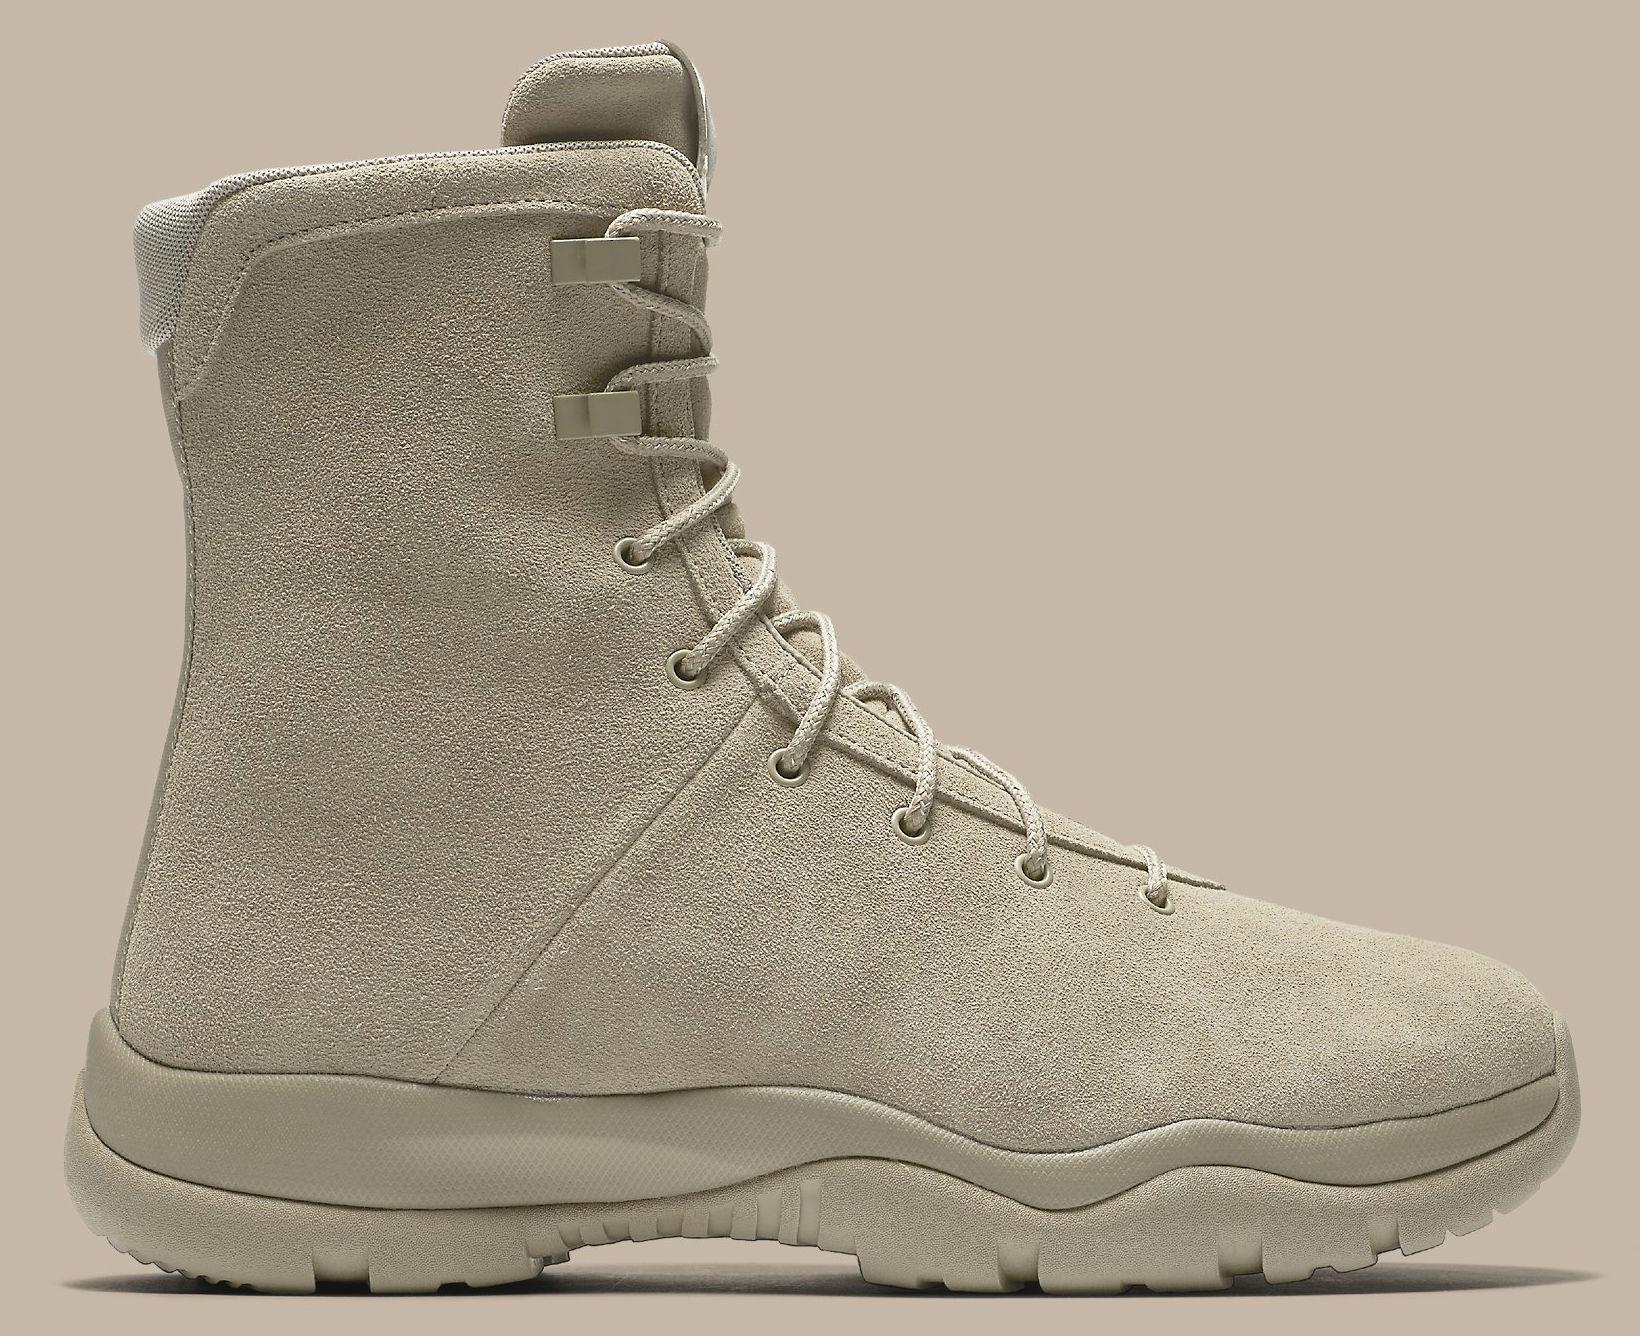 0e6eaf88d8d4 Air Jordan Future Boot Khaki Side 878222-205